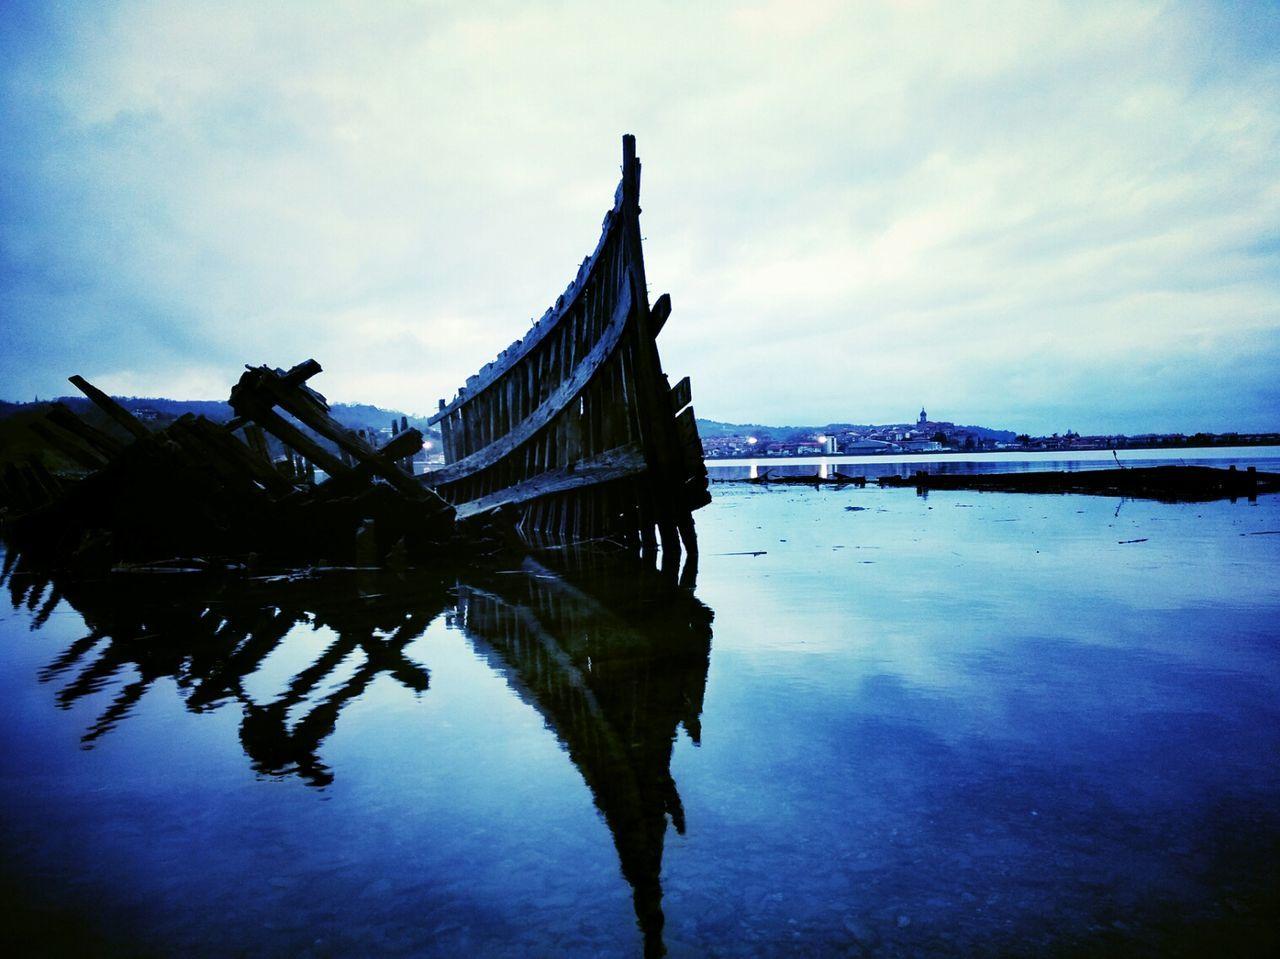 Al abordaje!!! ModopirataON Ampt - Reflections Reflection_collection EyeEm Best Shots - Reflections